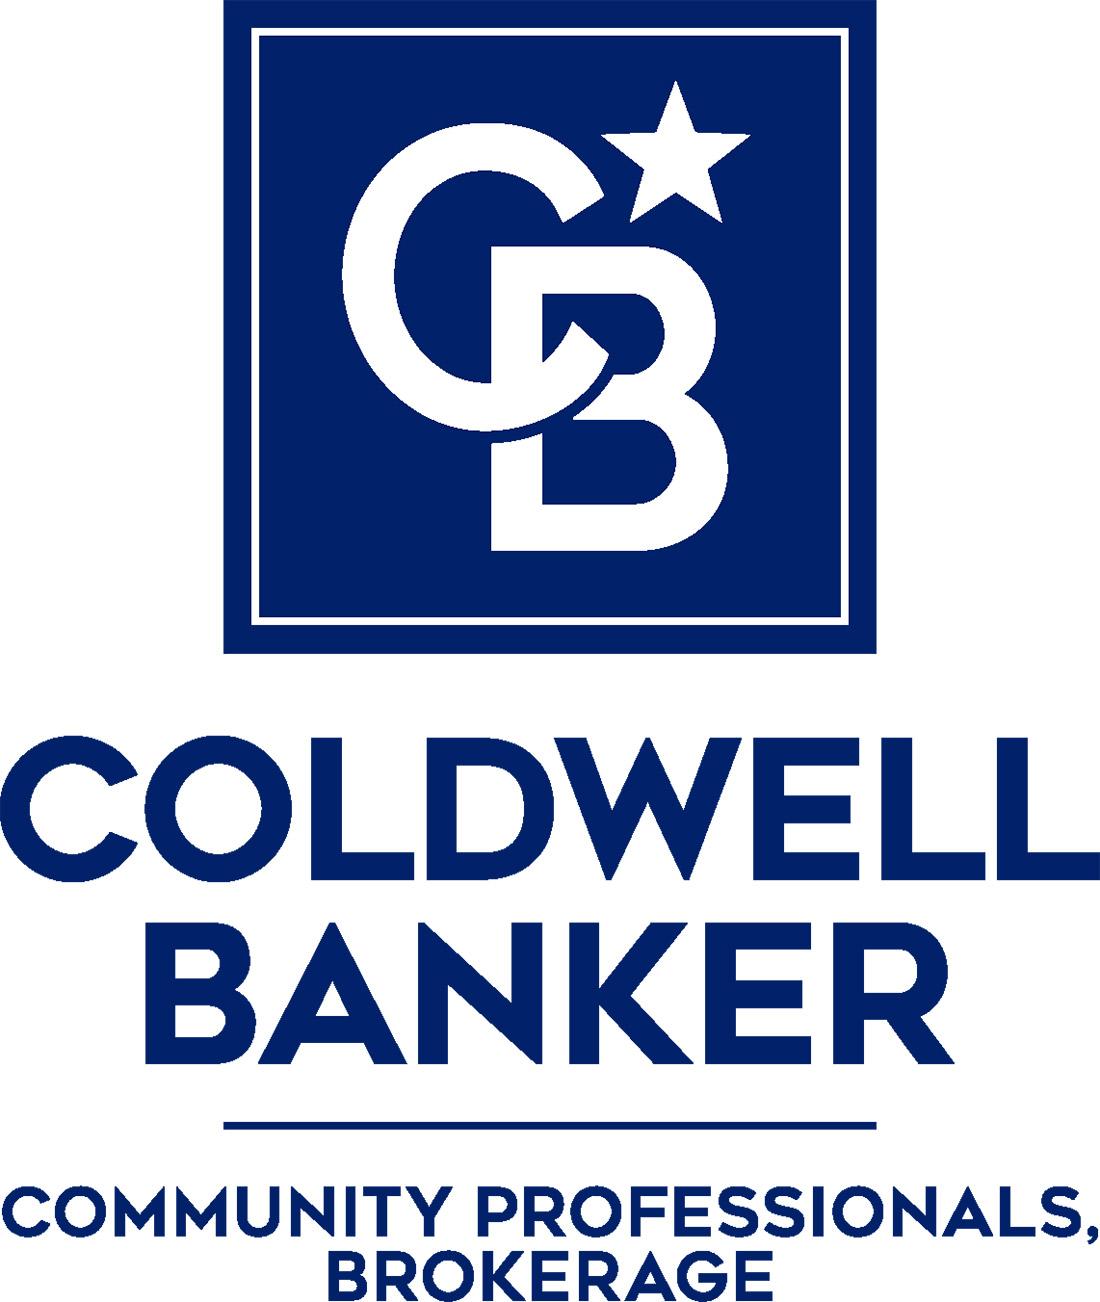 Maria Rocha - Coldwell Banker Community Professionals Logo